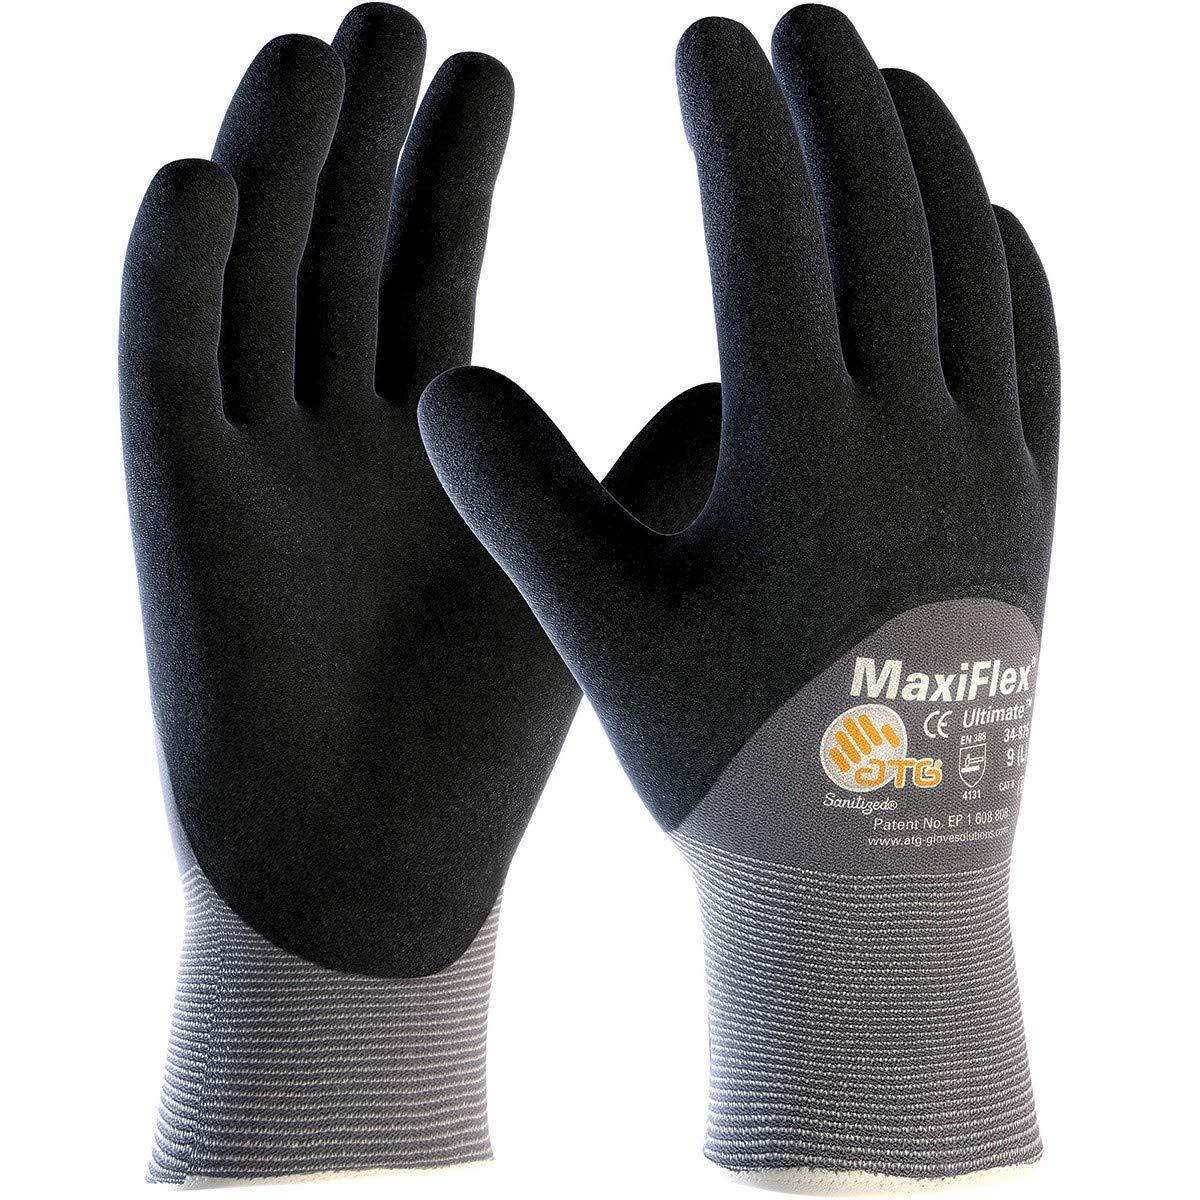 Knit Nylon//Lycra Gloves Fingers /& Knuckles CPreston Interests Nitrile Coated Micro-Foam Grip on Palm